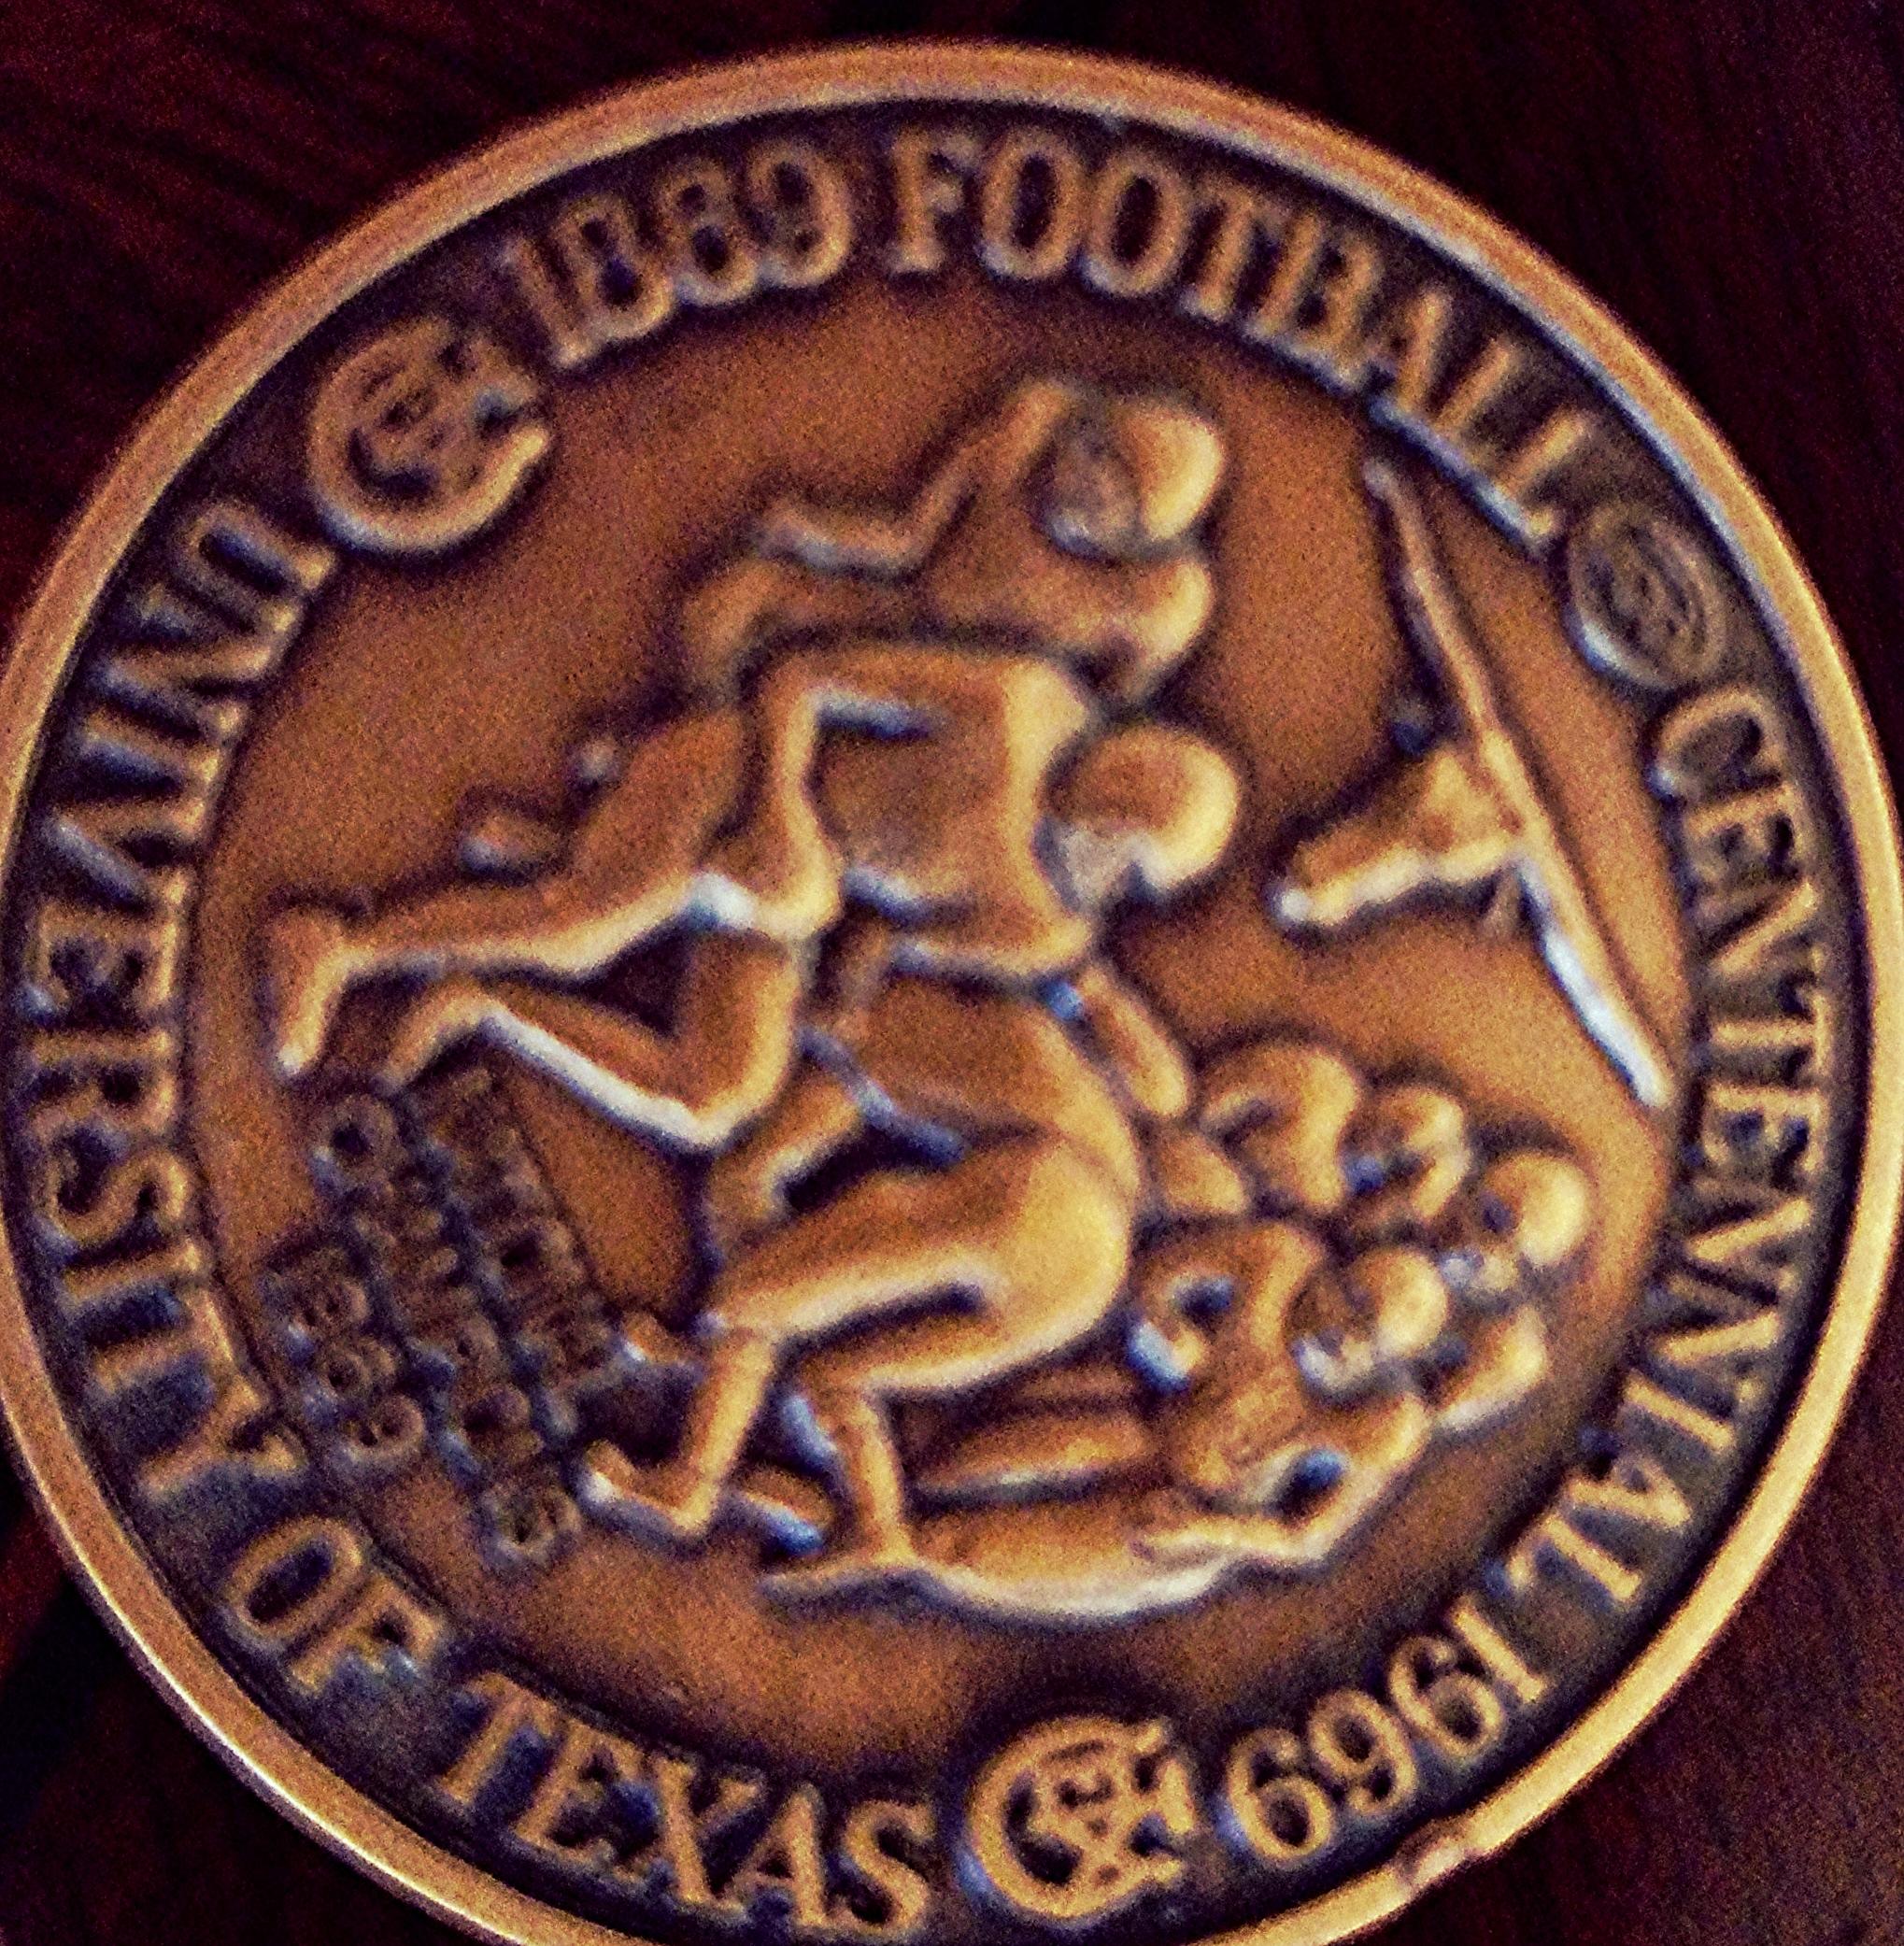 Centennial medallion 100th year of College football